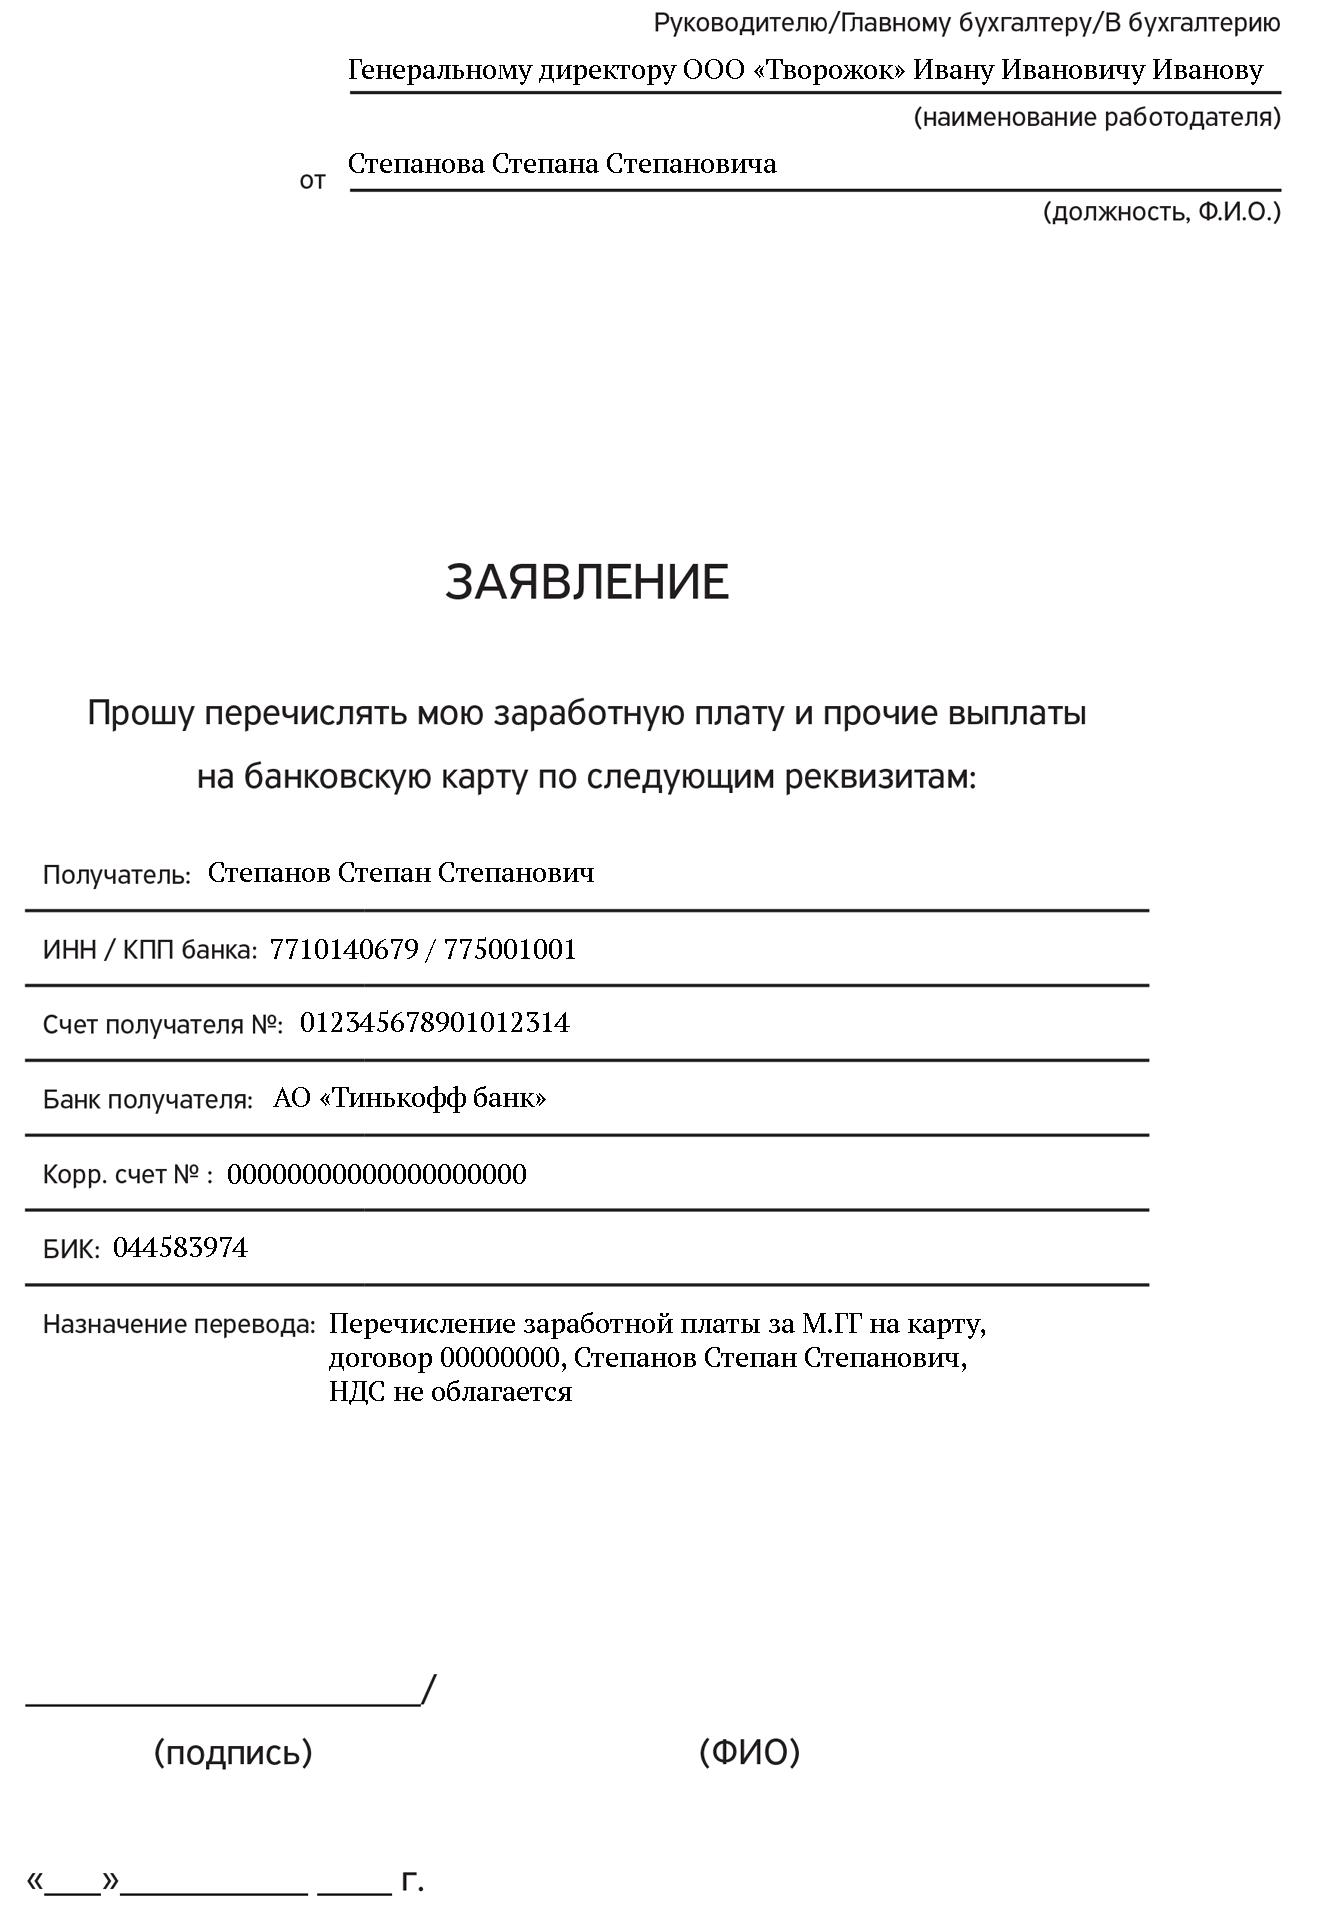 Шаблон заявления